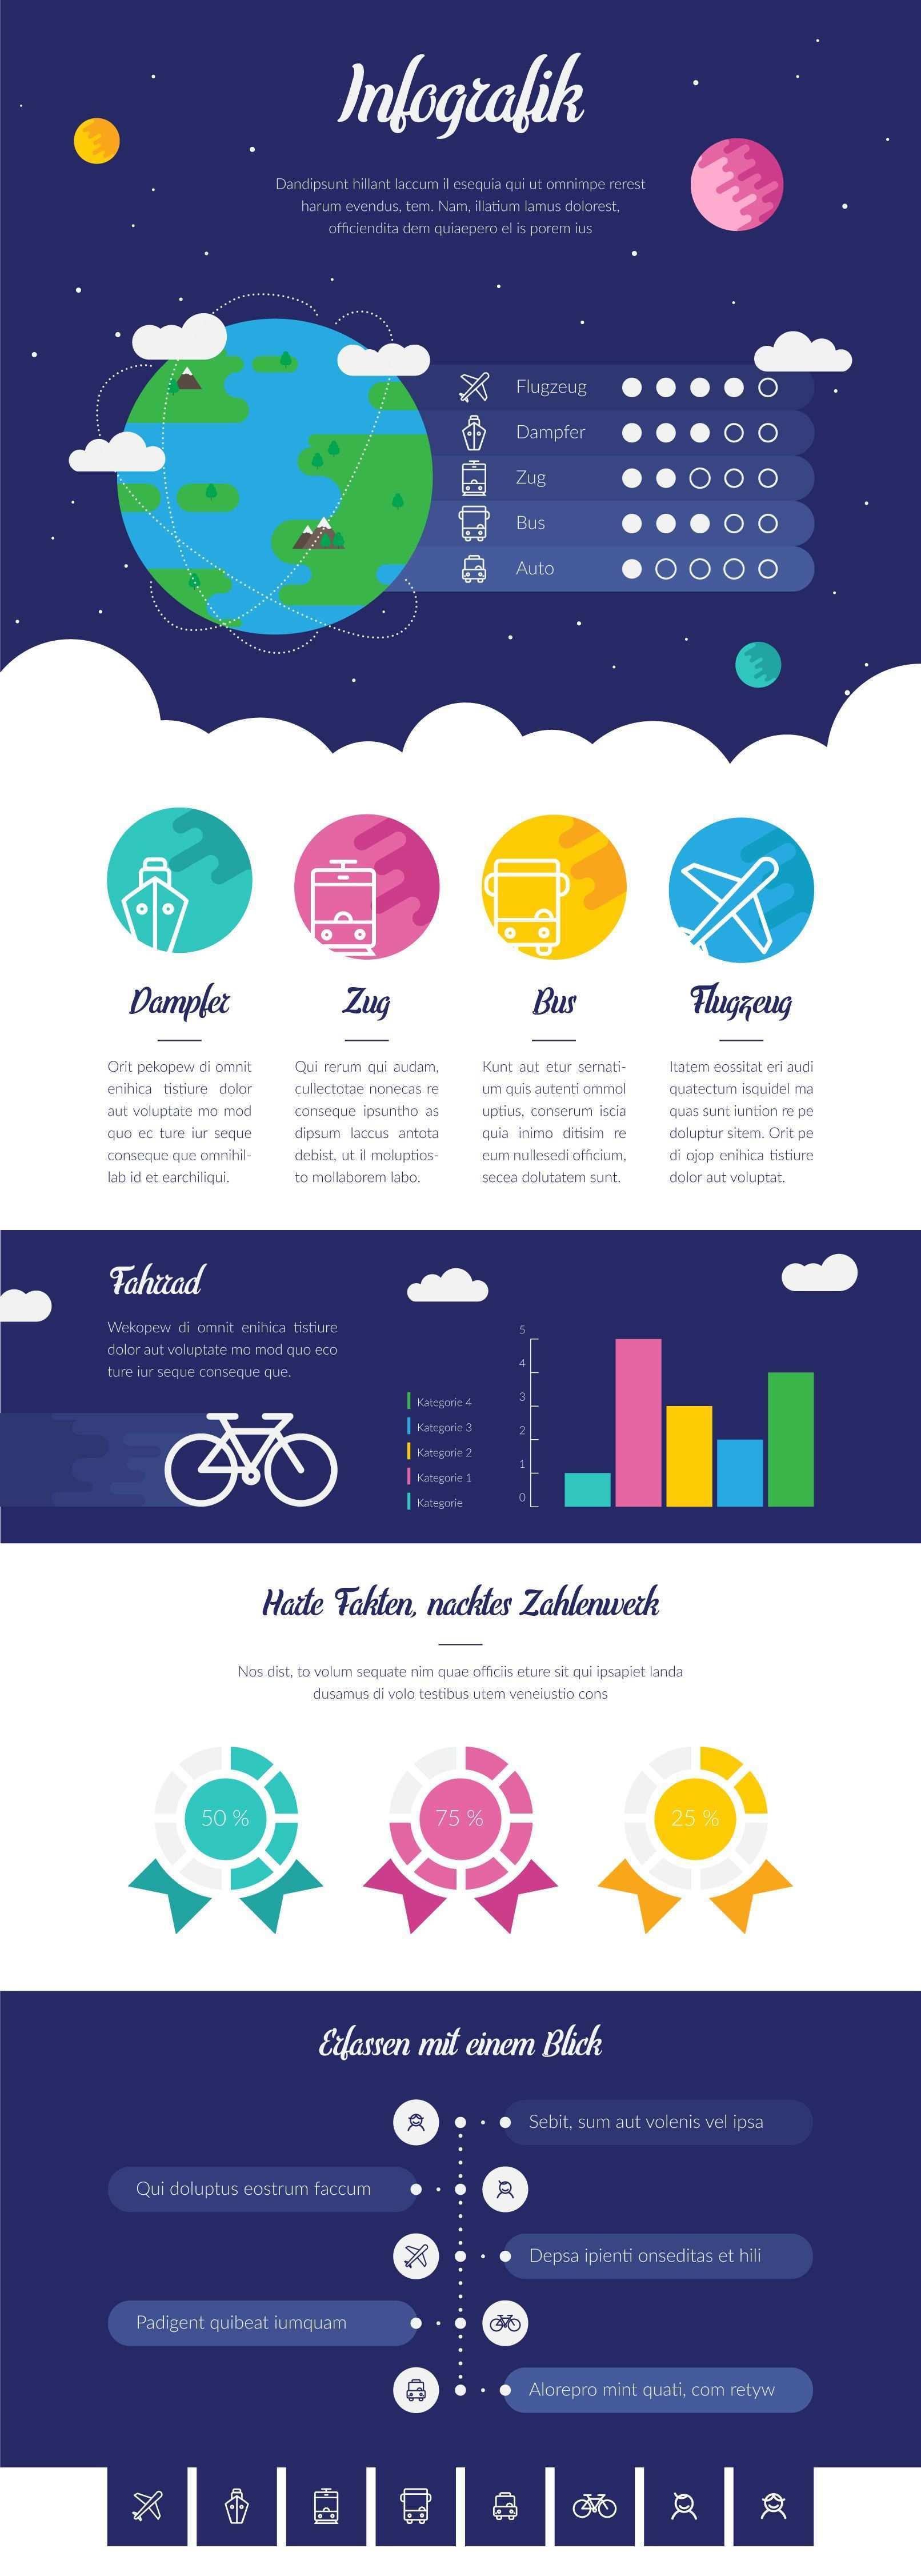 Design Vorlagen Fur Infografiken Infografik Infografik Erstellen Grafik